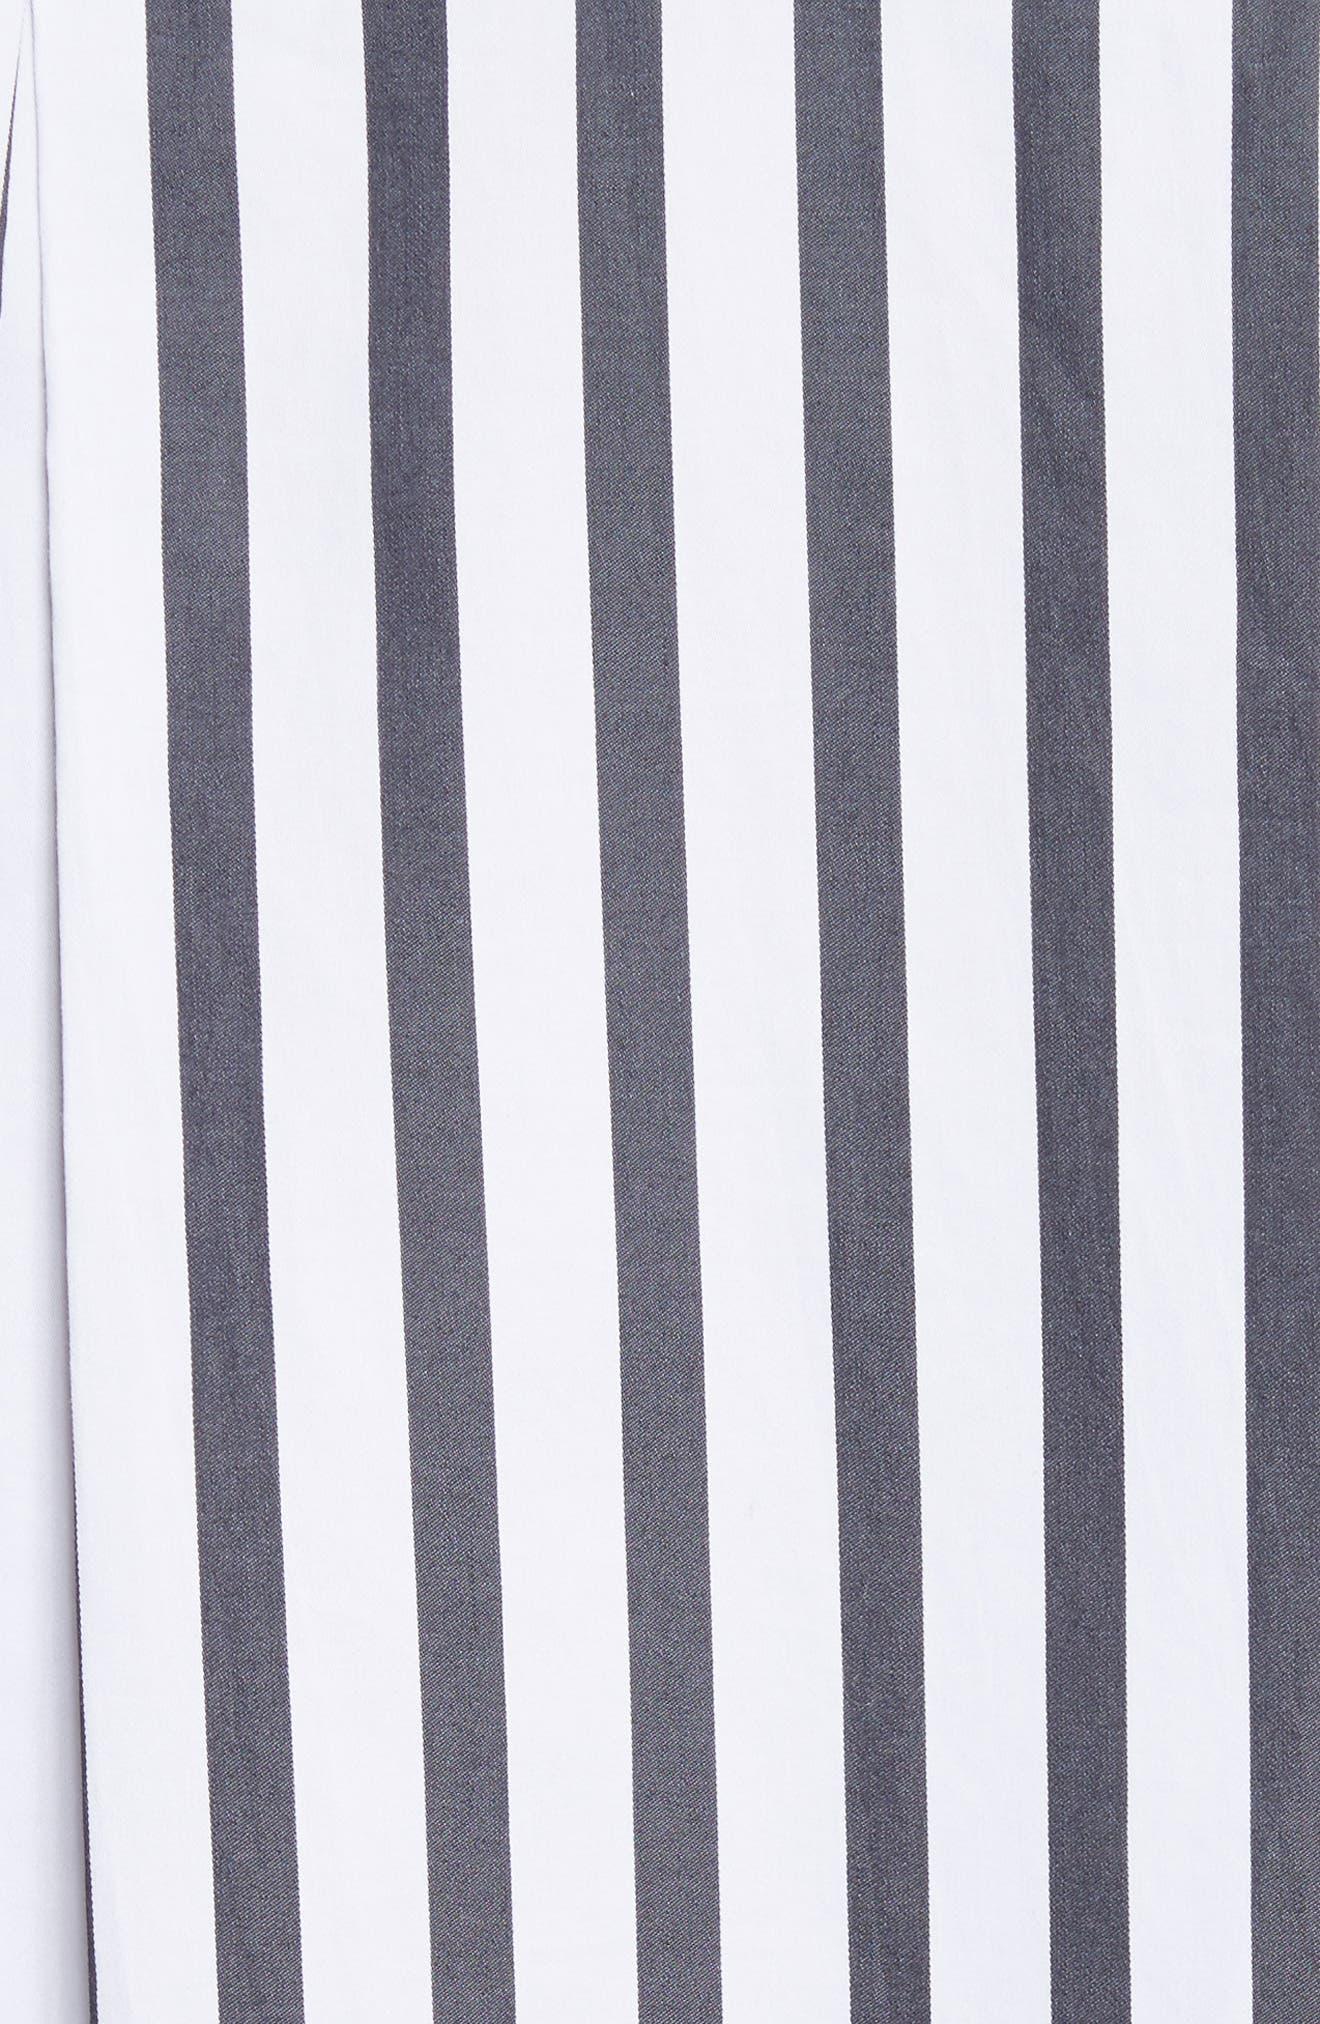 Rossi Contrast Stripe Button Down Shirt,                             Alternate thumbnail 5, color,                             Bright White/ Eclipse